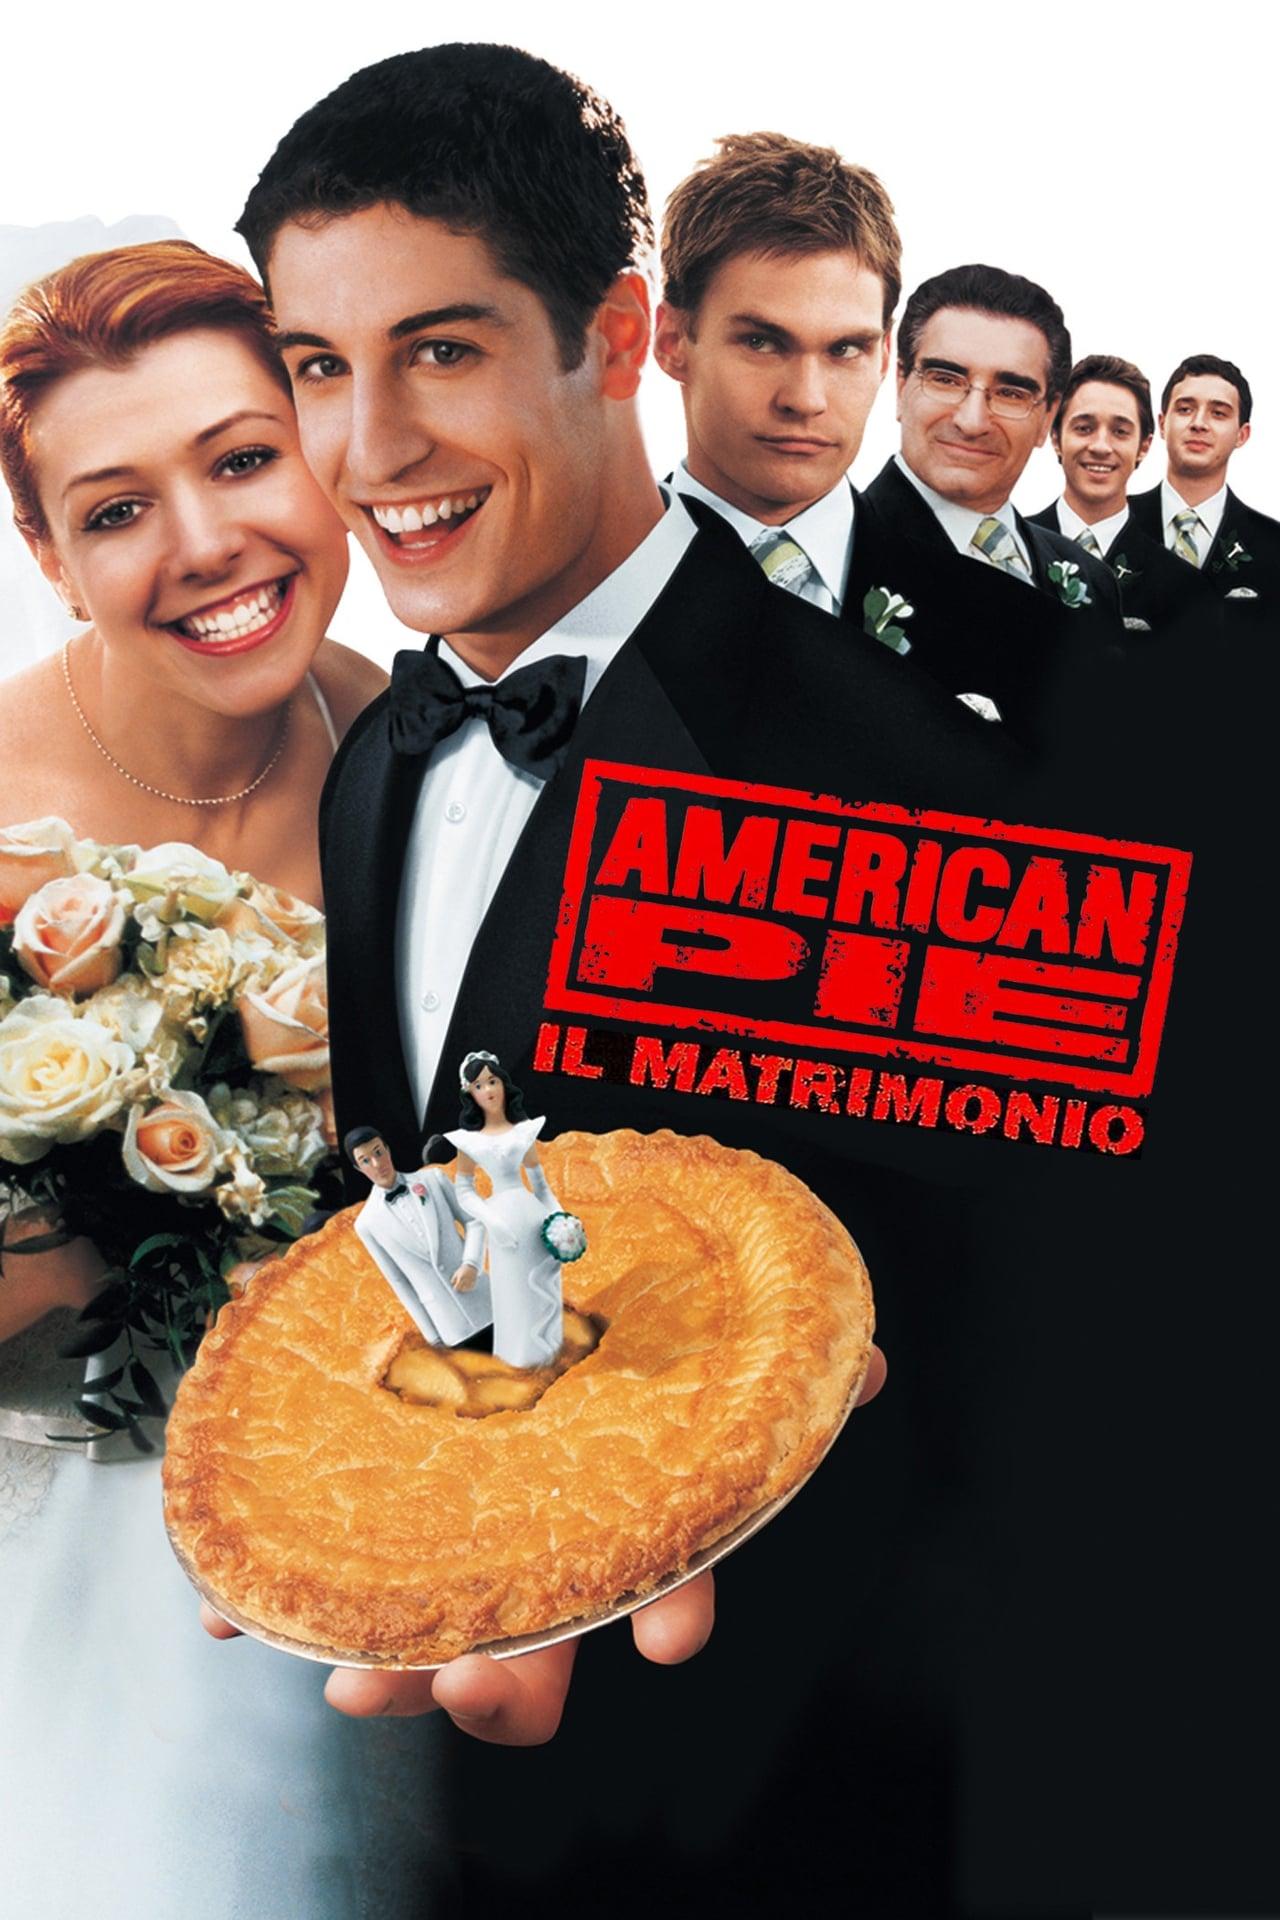 American pie blow job